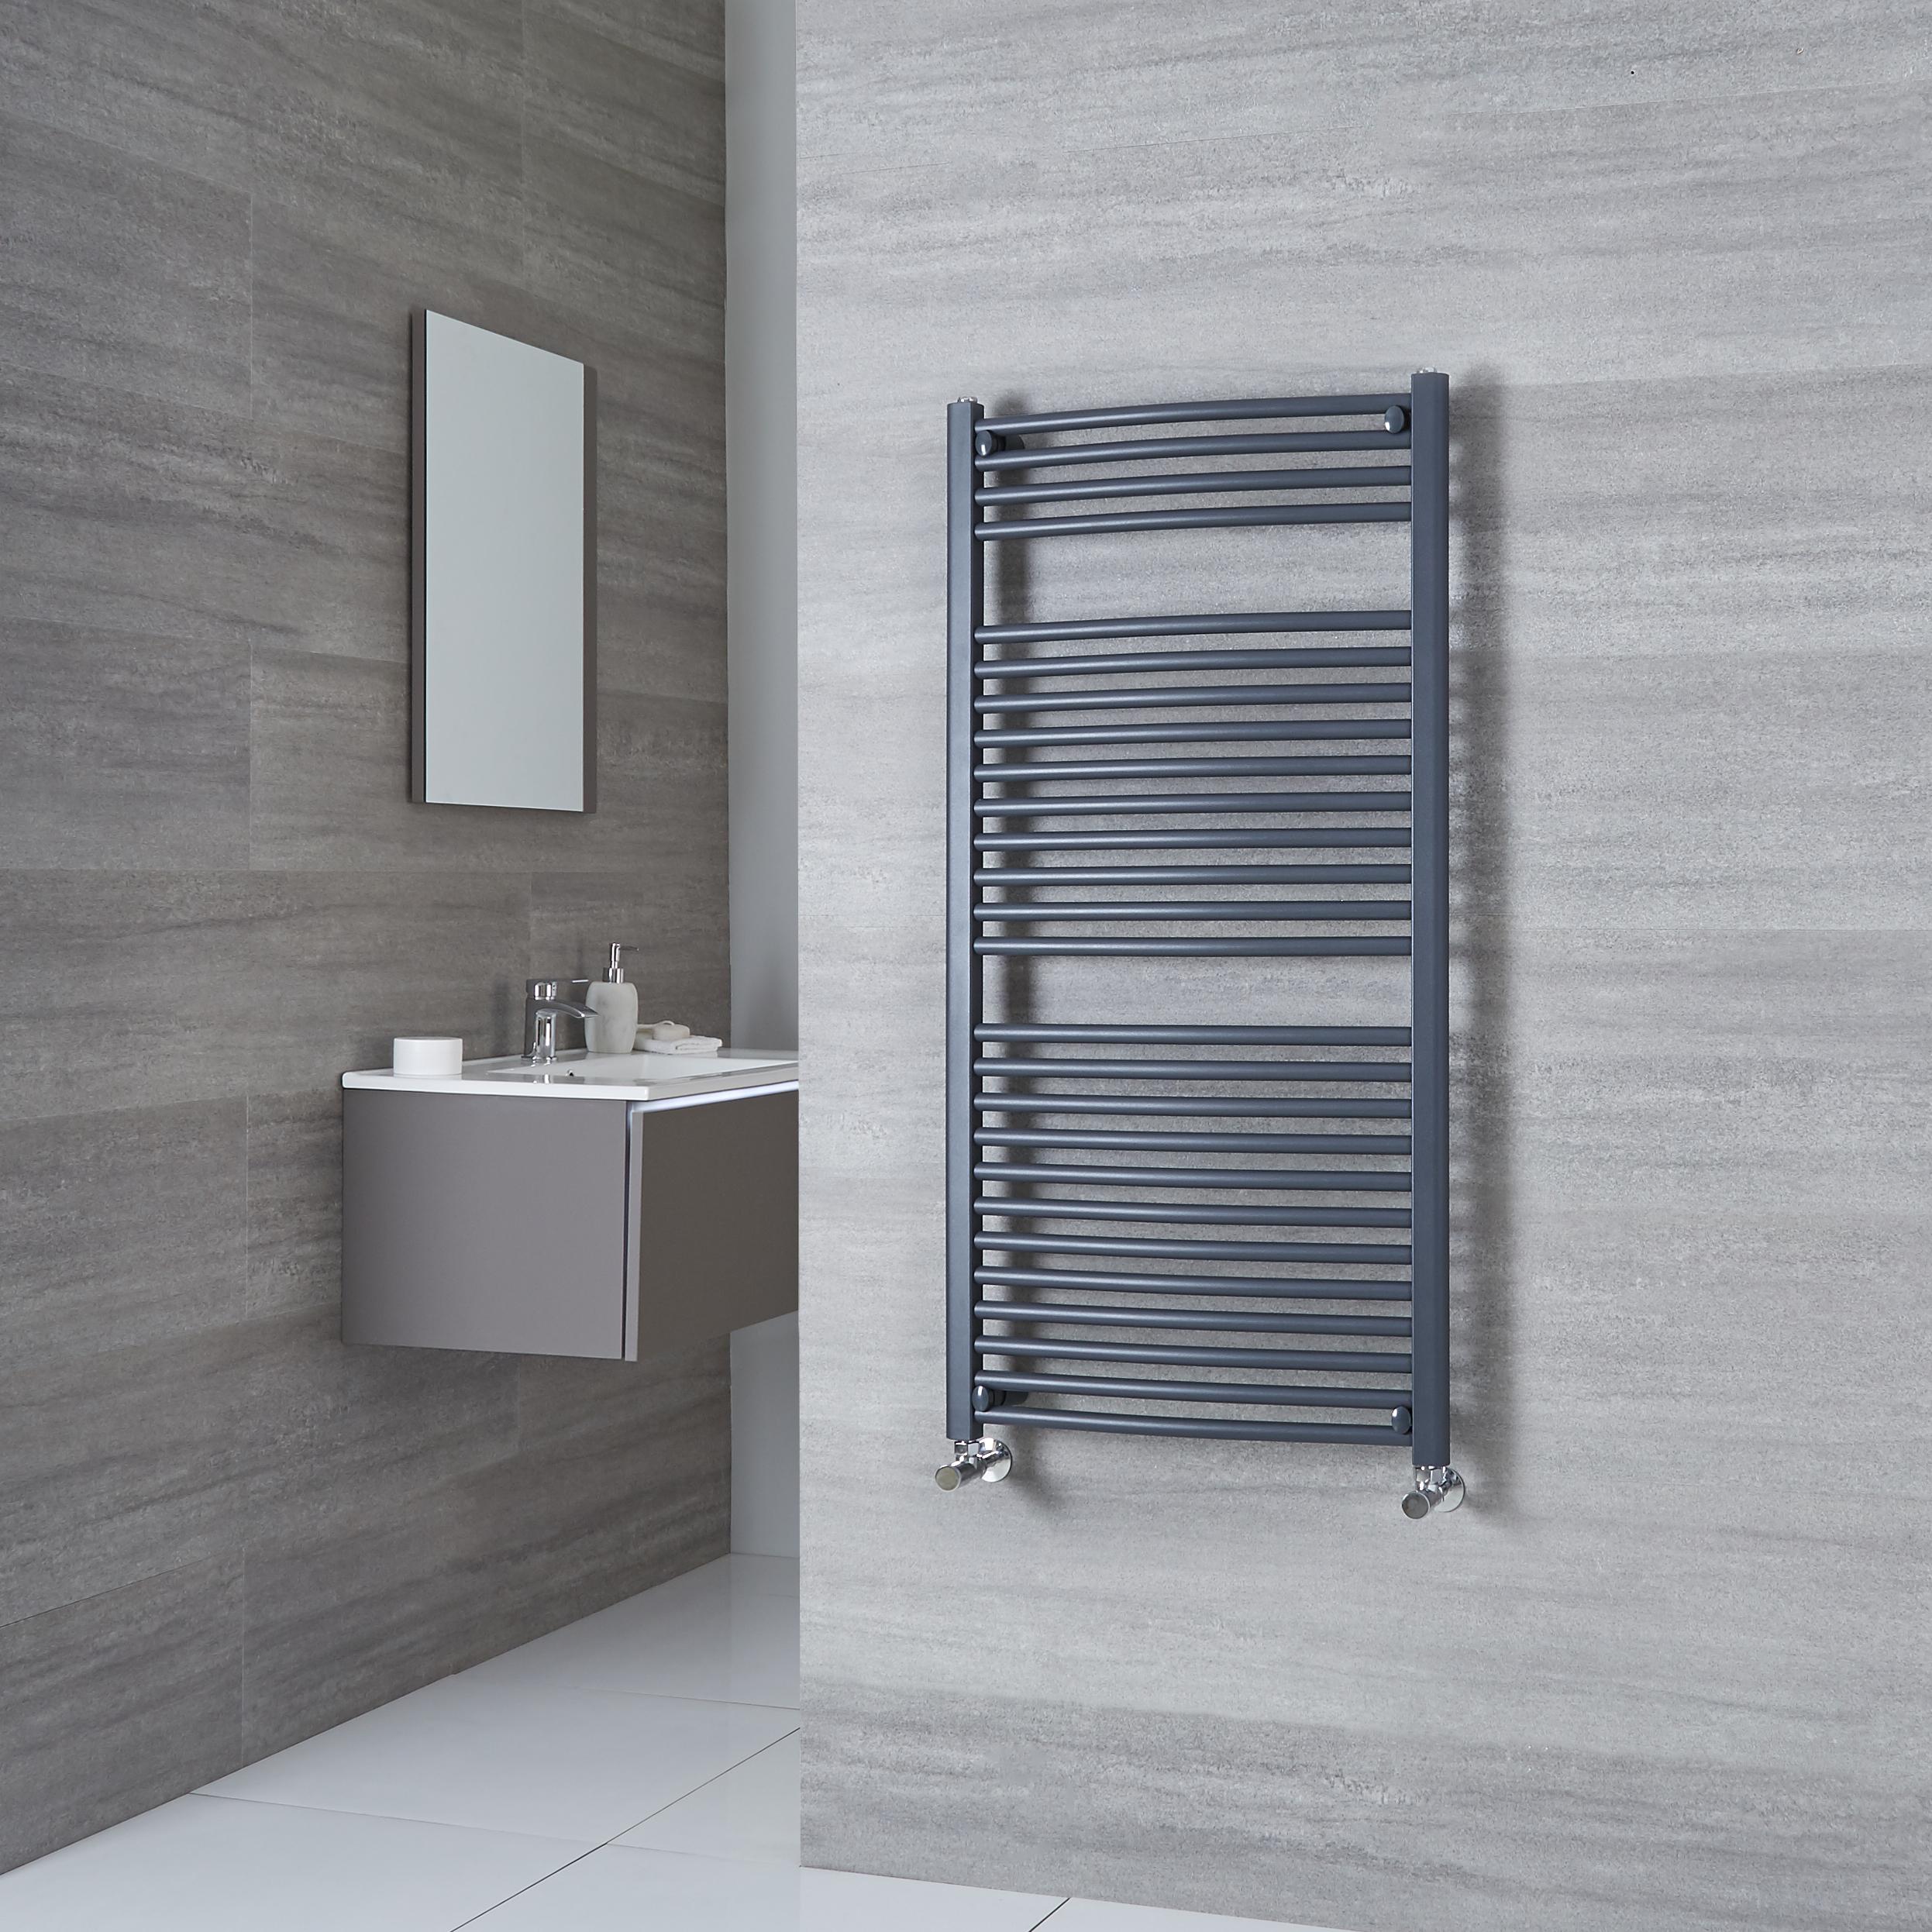 Milano Brook - Anthracite Flat Heated Towel Rail 1200mm x 500mm